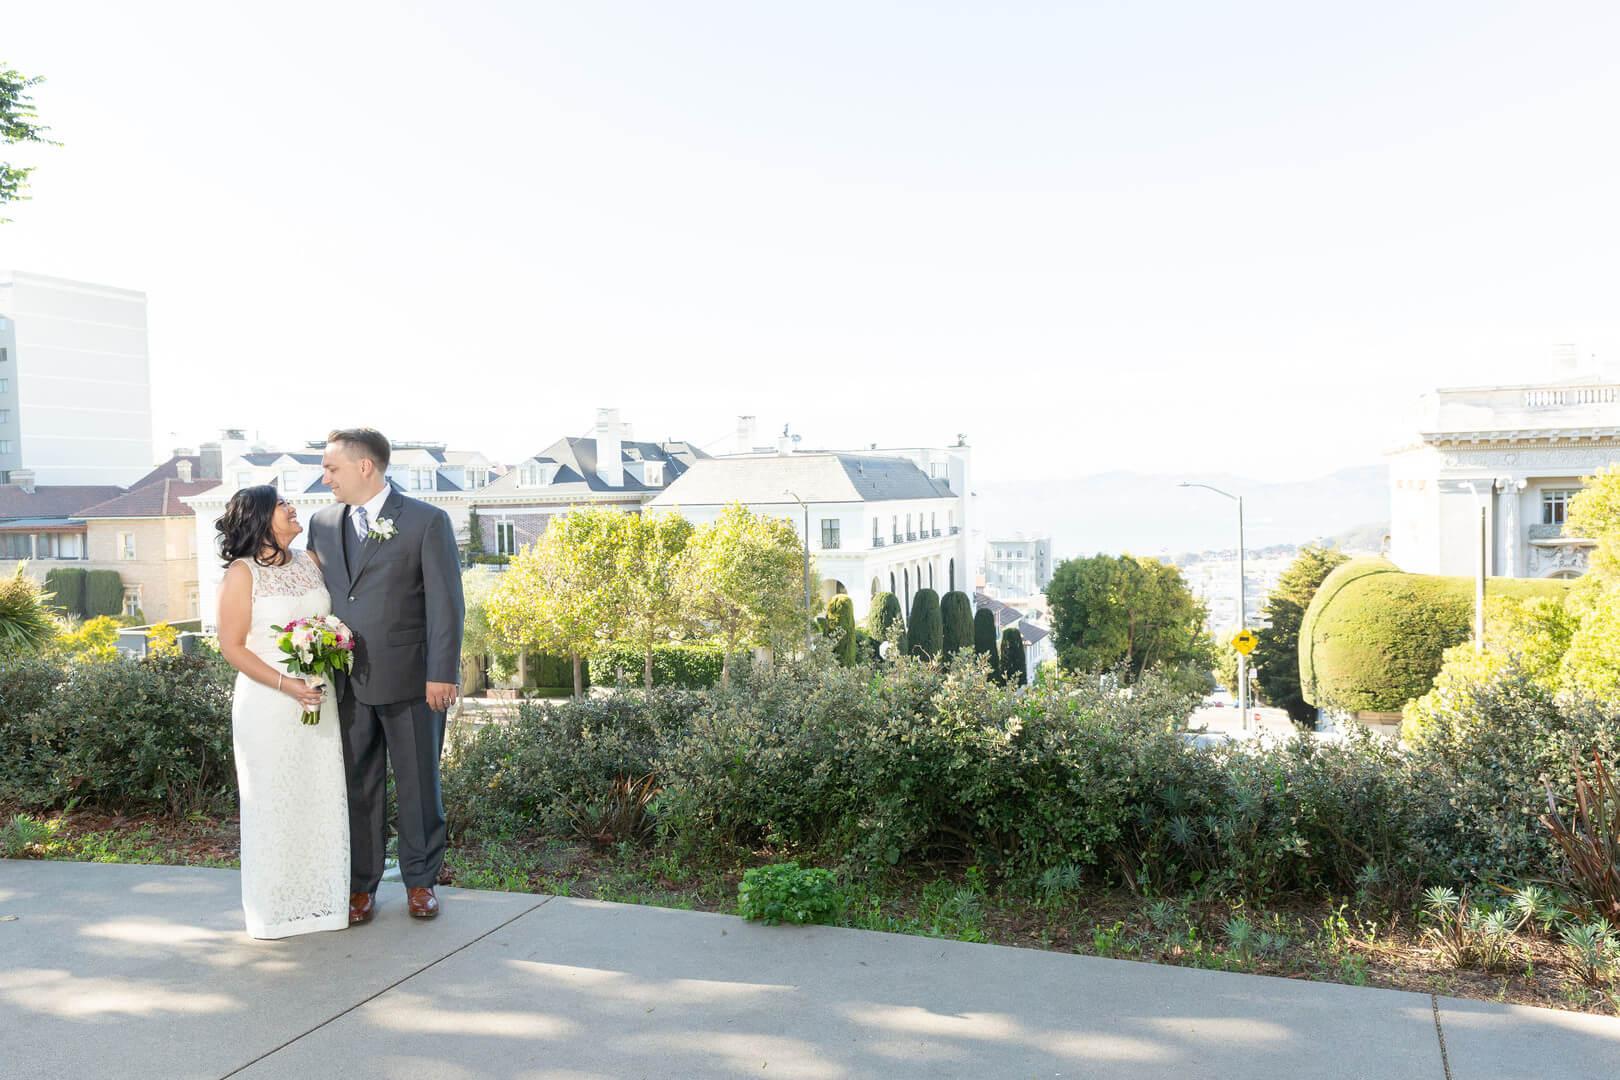 San Francisco wedding - Mark and Derkje - street photo